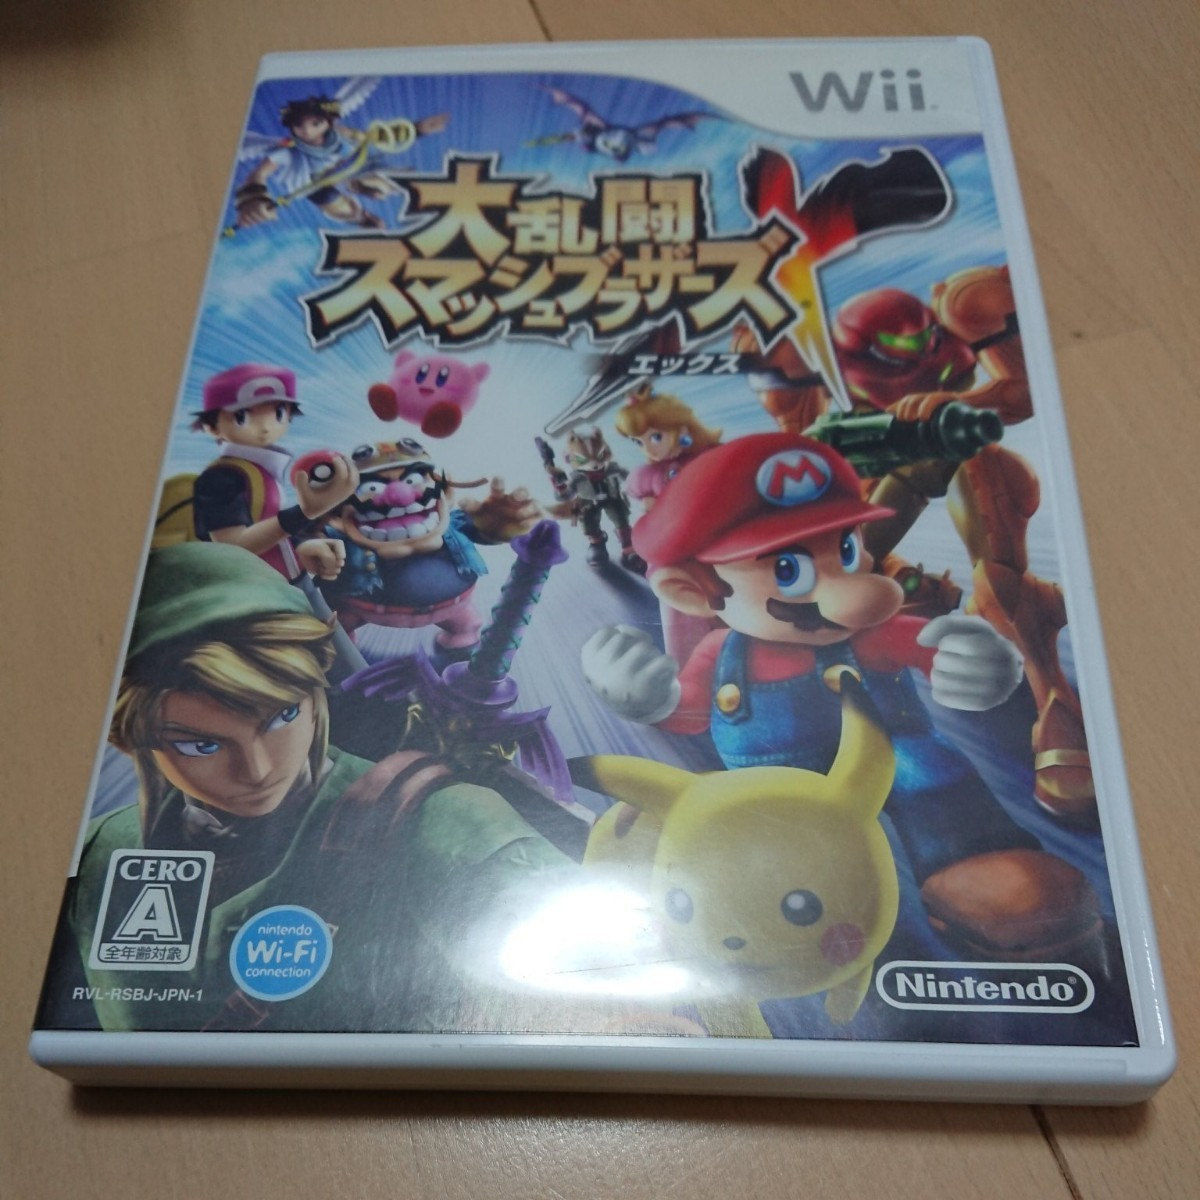 Nintendo Wiiソフト「大乱闘スマッシュブラザーズX」